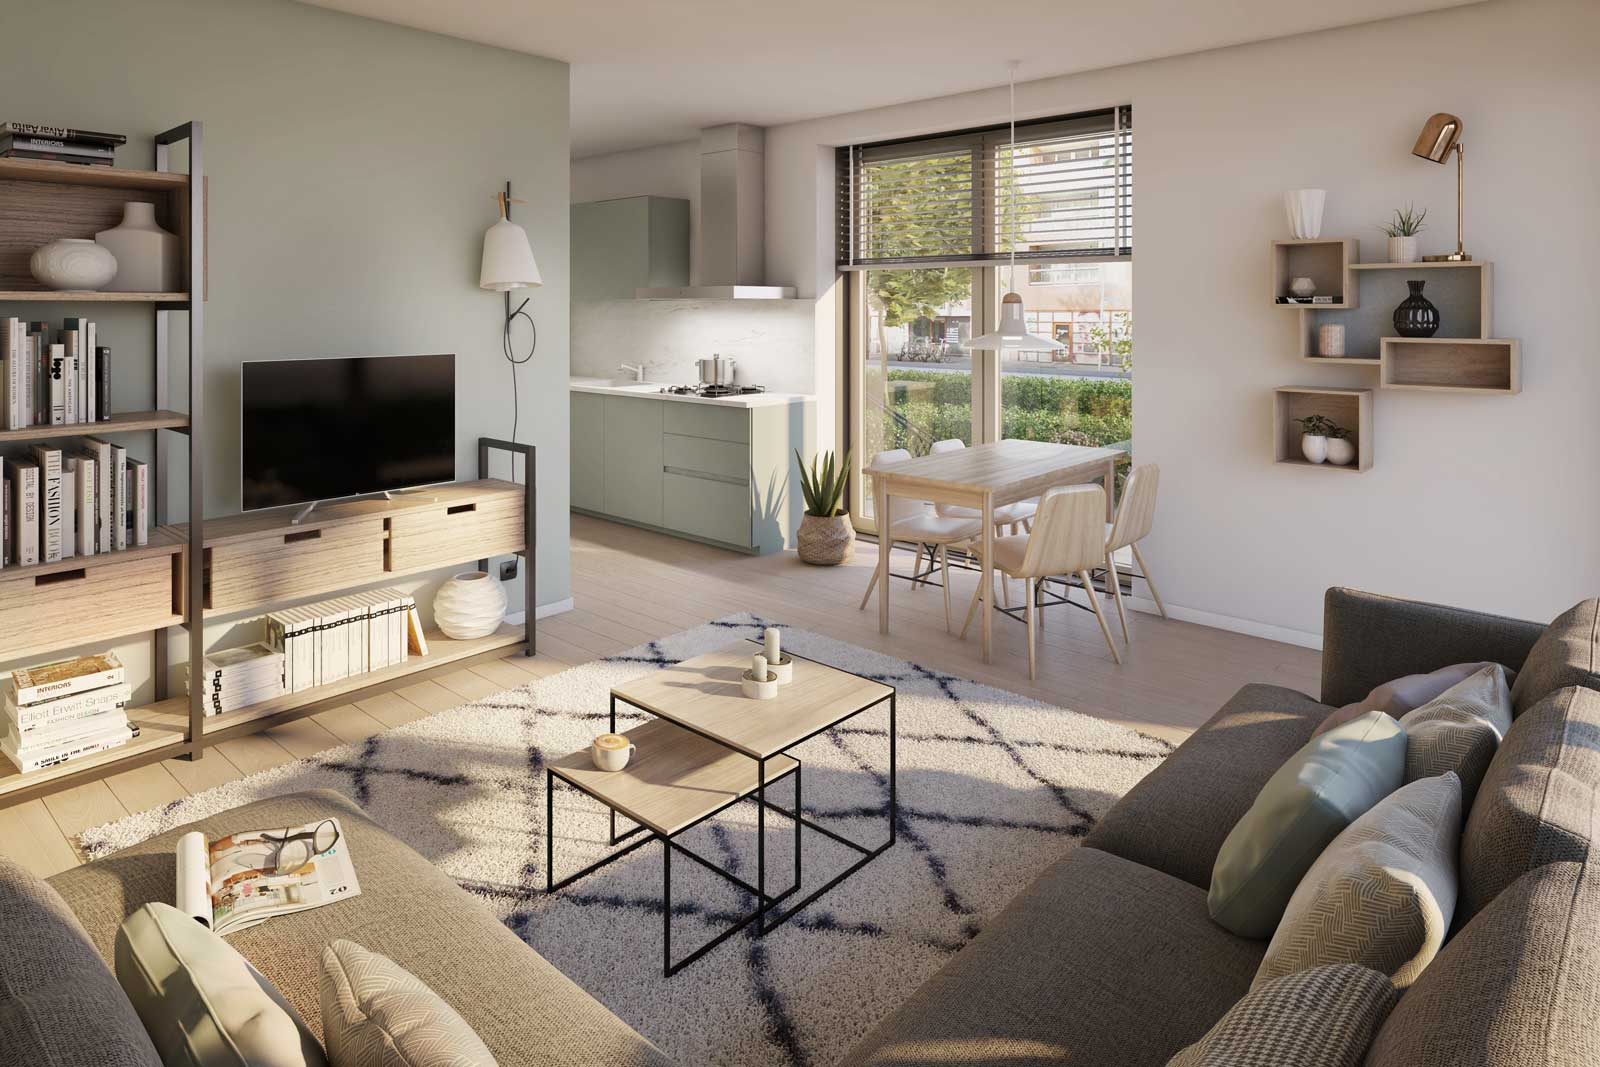 Appartementencomplex Welgelegen Blok G Utrecht - impressie interieur